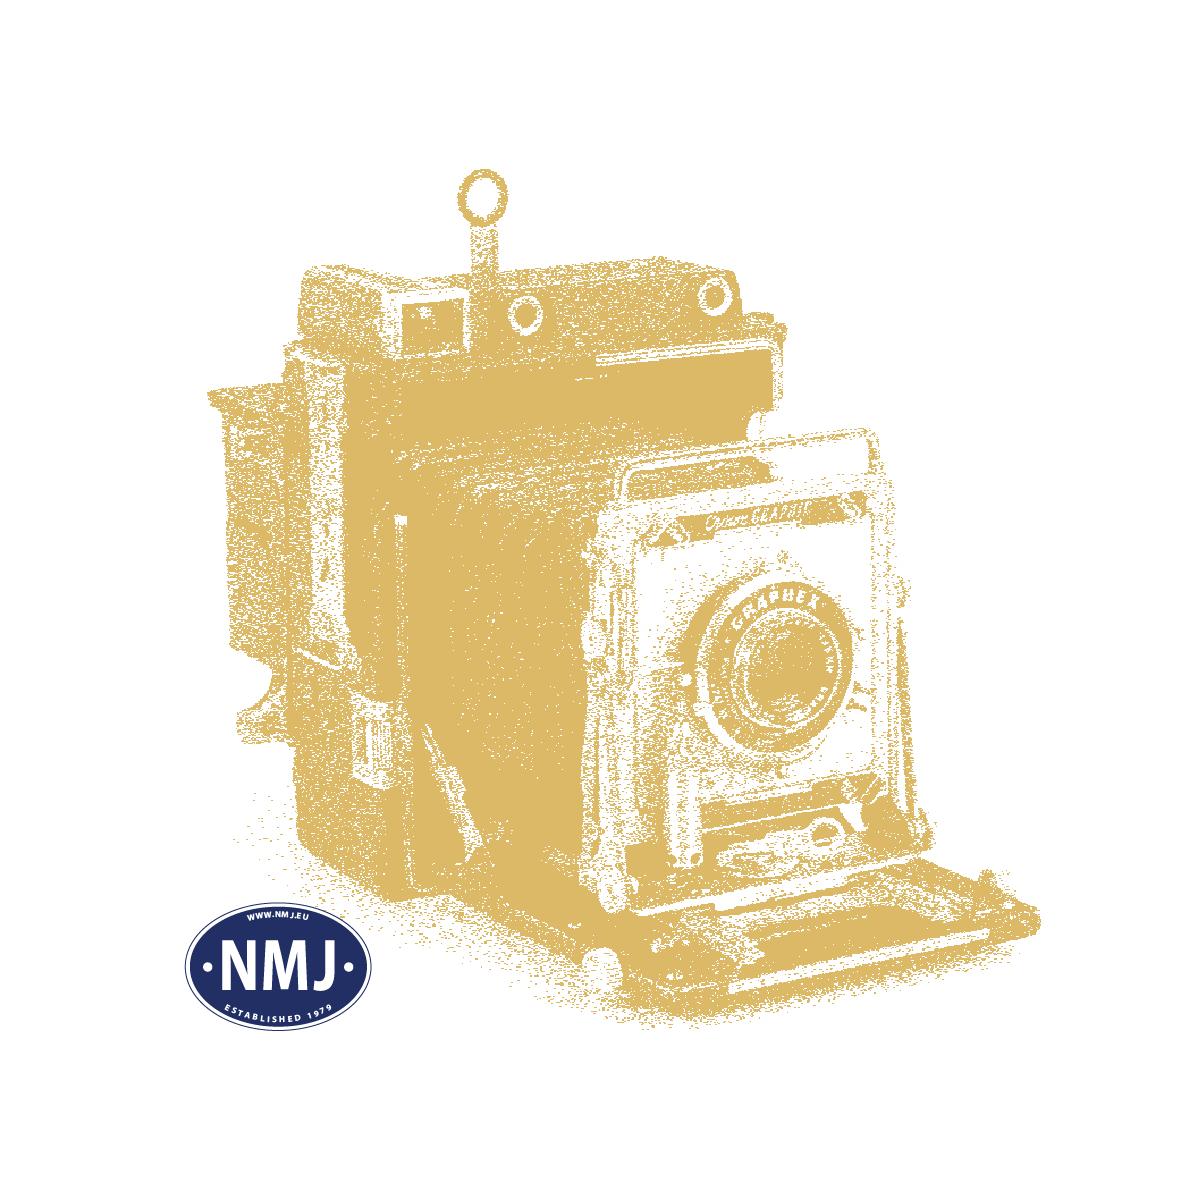 PPA69100 - Sofft Applikatorsett, 44 deler